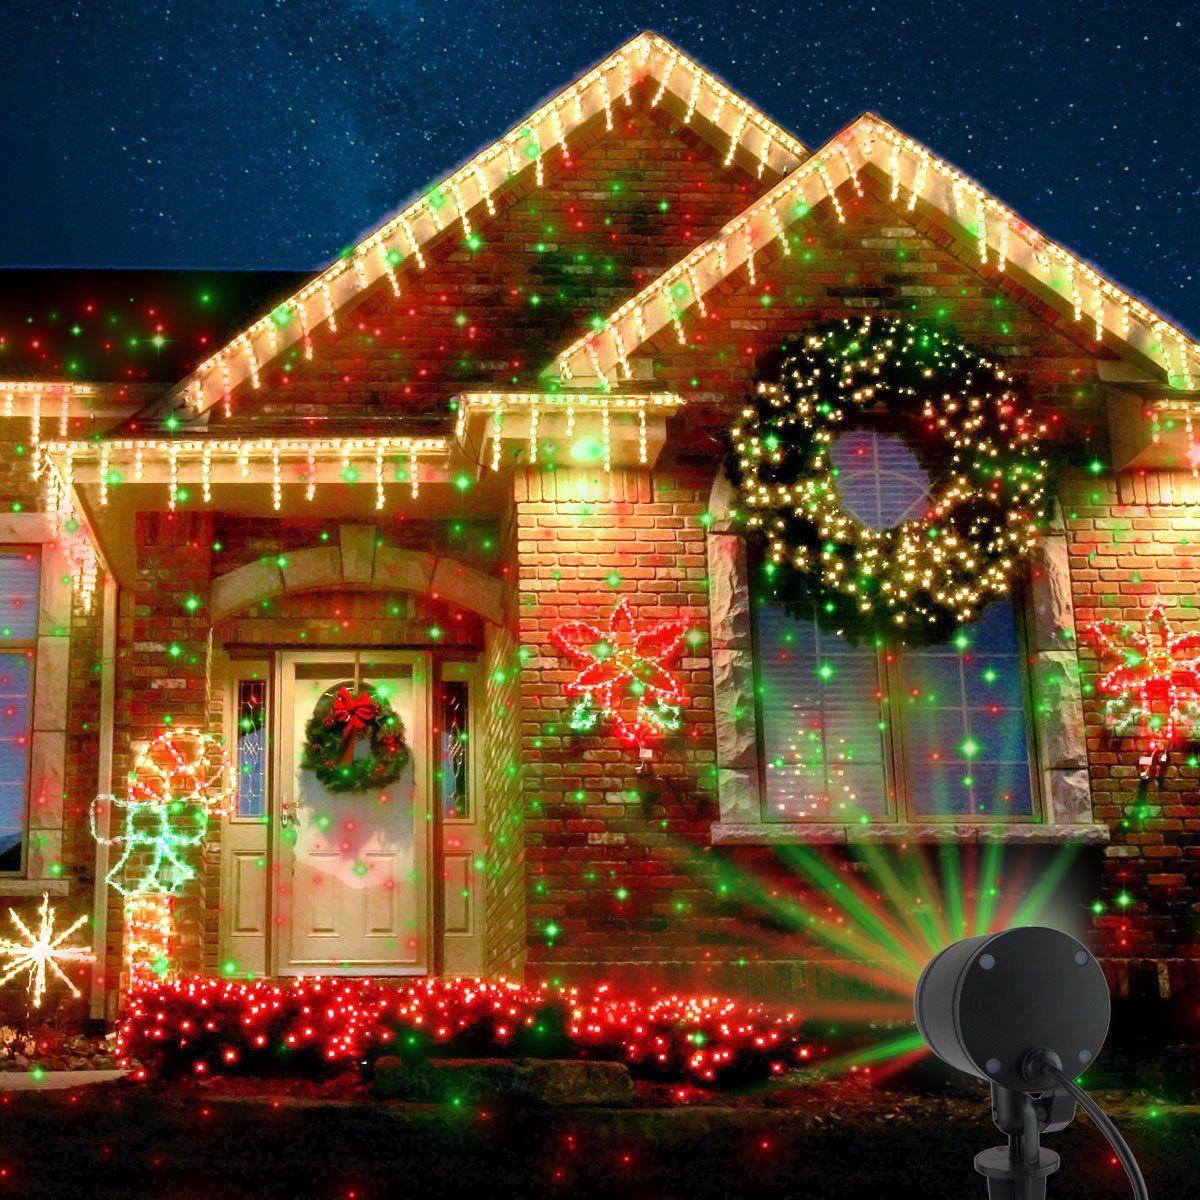 Halloween Decorations Starry Laser Lights Landscape Projector Lights Outdoor Waterp Best Christmas Lights Christmas Light Installation Laser Christmas Lights